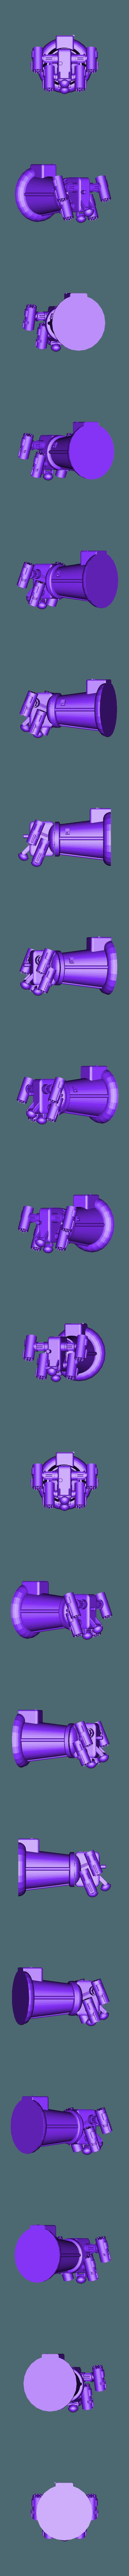 Rocket_tower.stl Download free STL file Anti-aircraft tower for 28mm wargames, Warhammer, Star wars, Gas lands ect • 3D print model, redstarkits